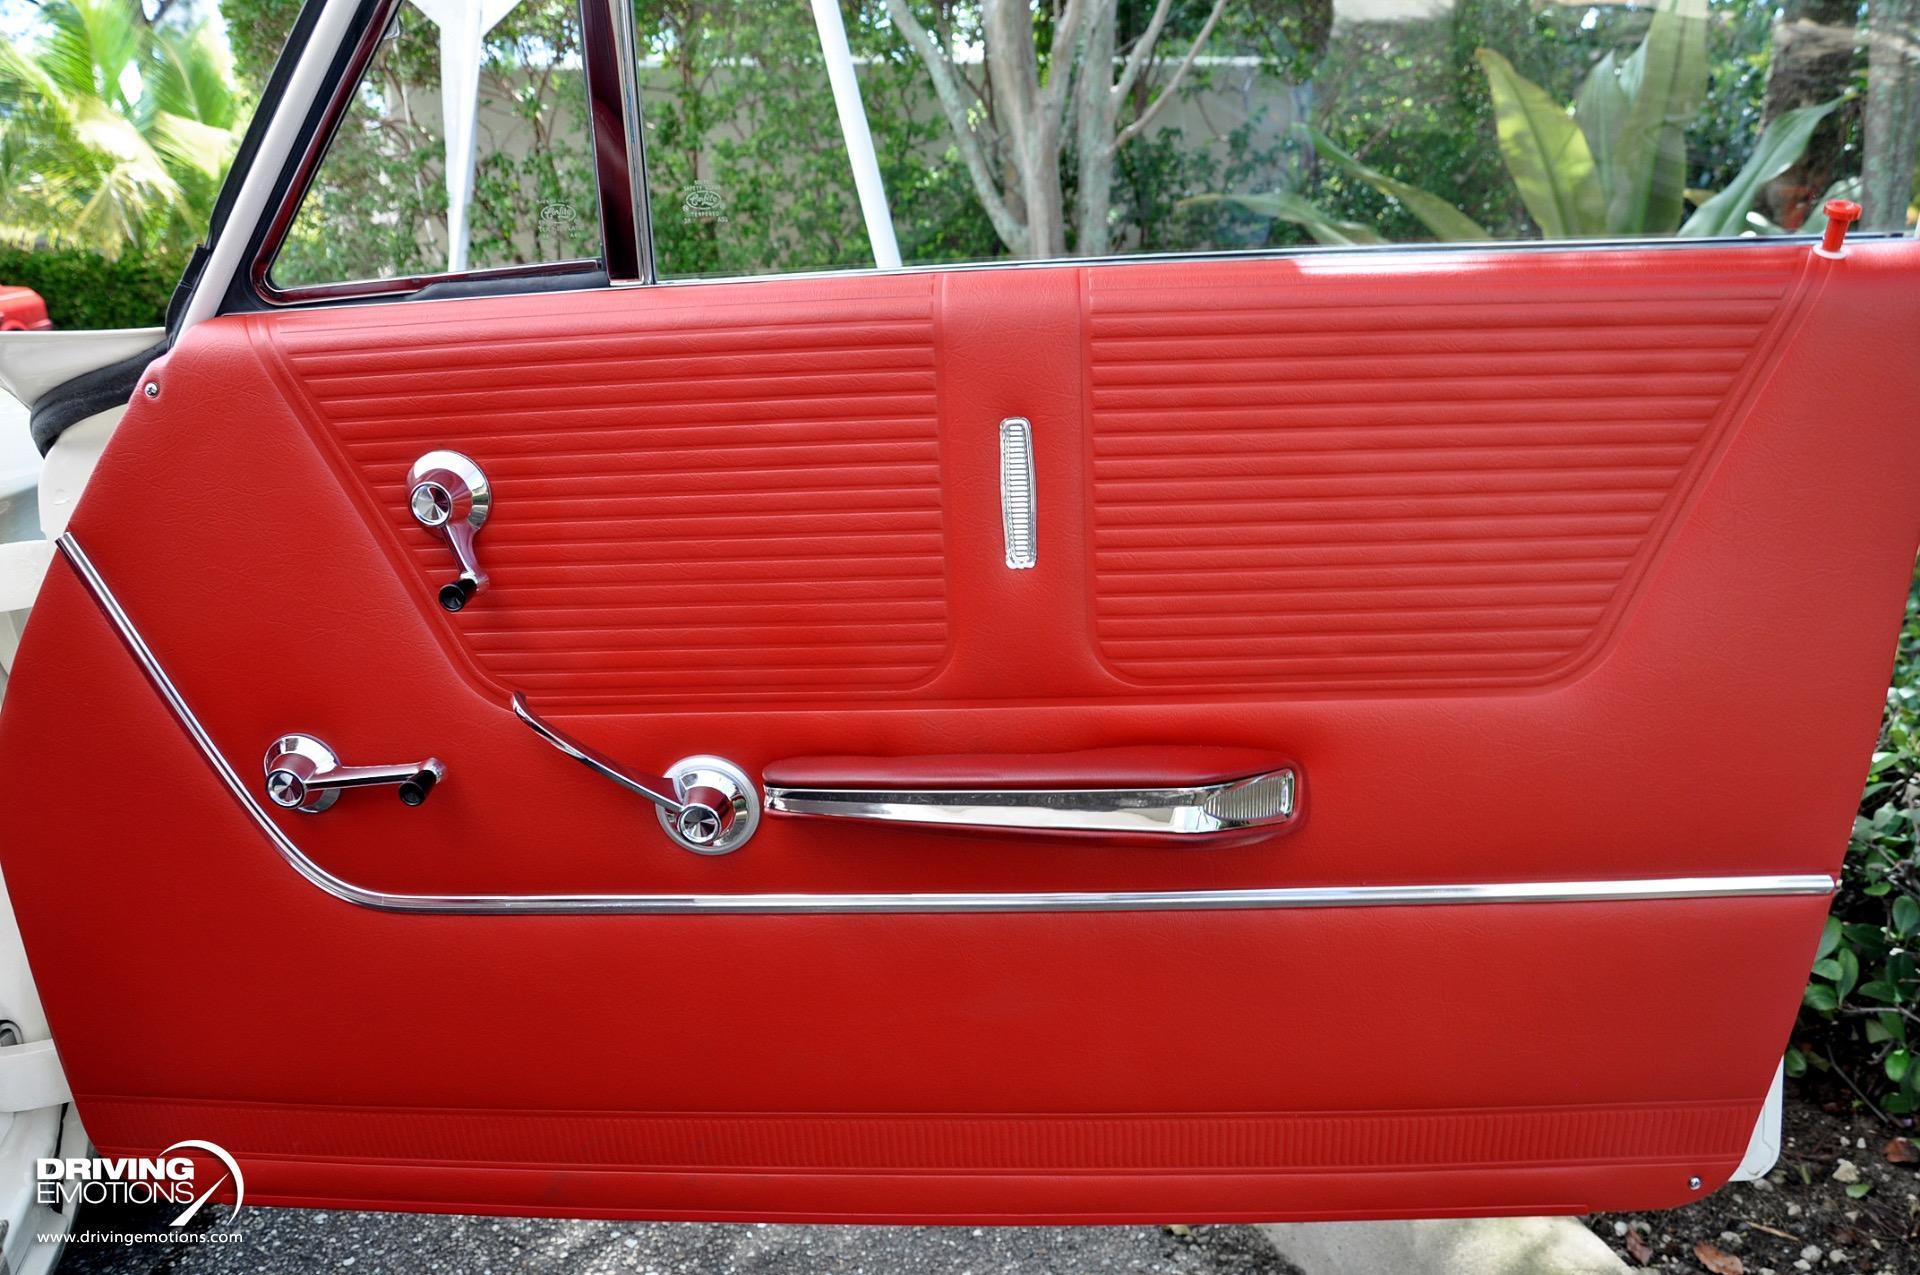 Used 1964 Ford Galaxie Custom 500  | Lake Park, FL